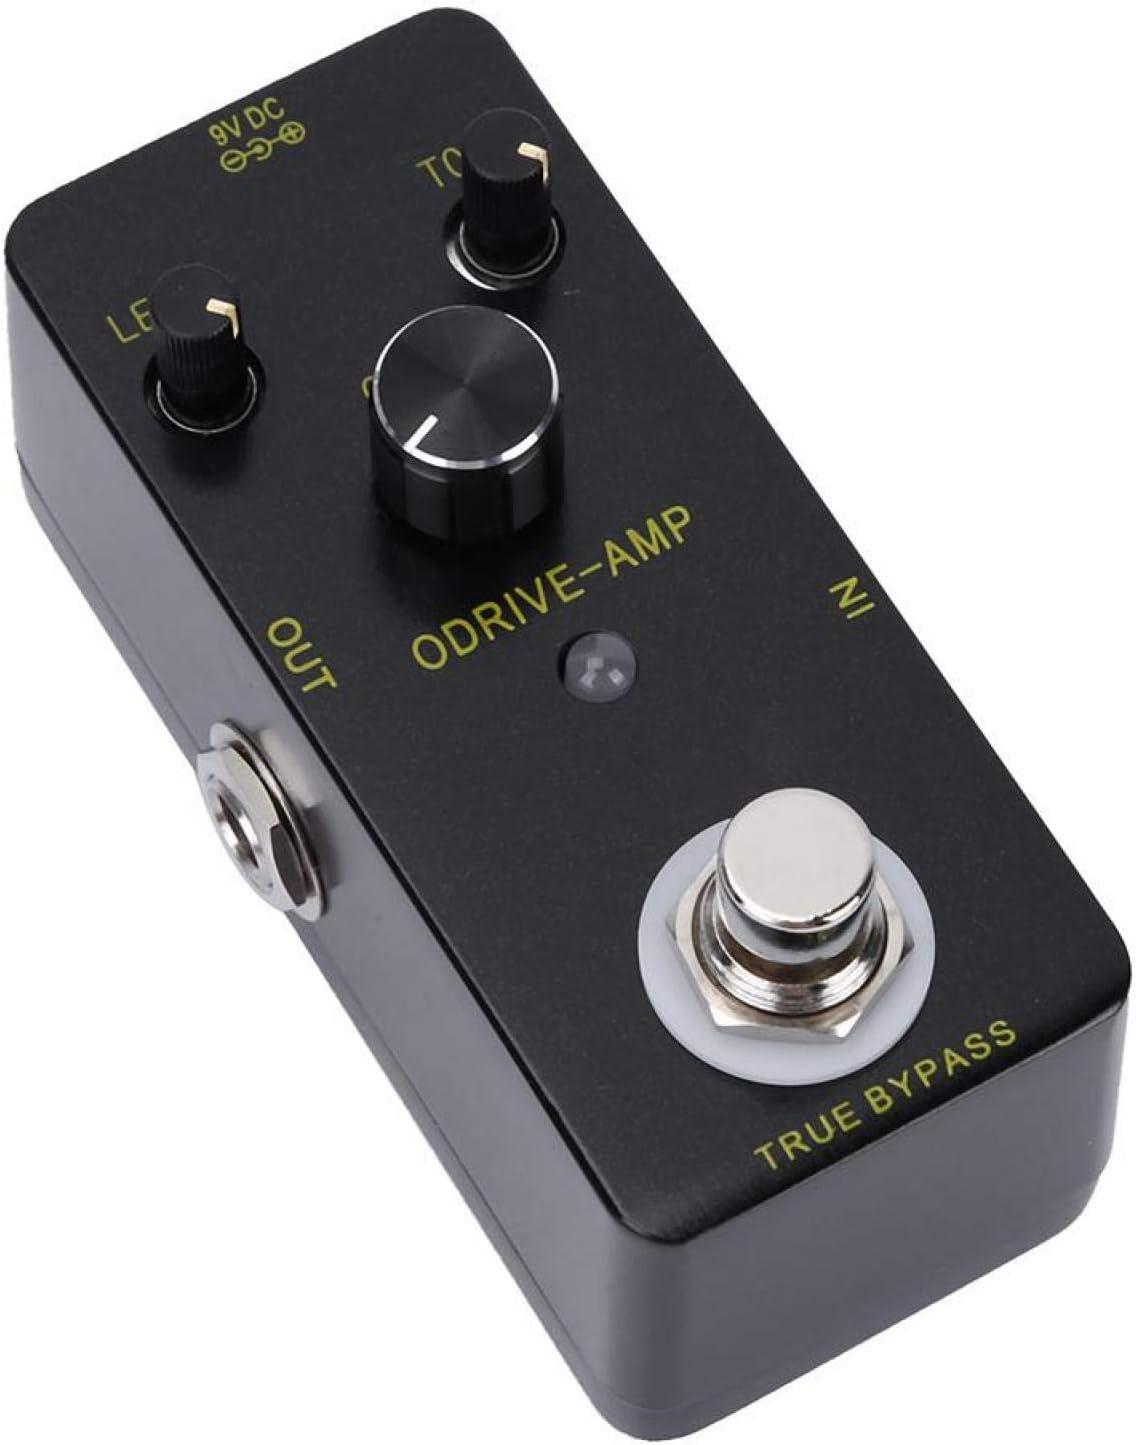 Pedal de efecto de guitarra Overdrive, carcasa de aleación de zinc Guitarra eléctrica Estilo ODRIVE-AMP Distorsión del pedal de efecto Overdrive